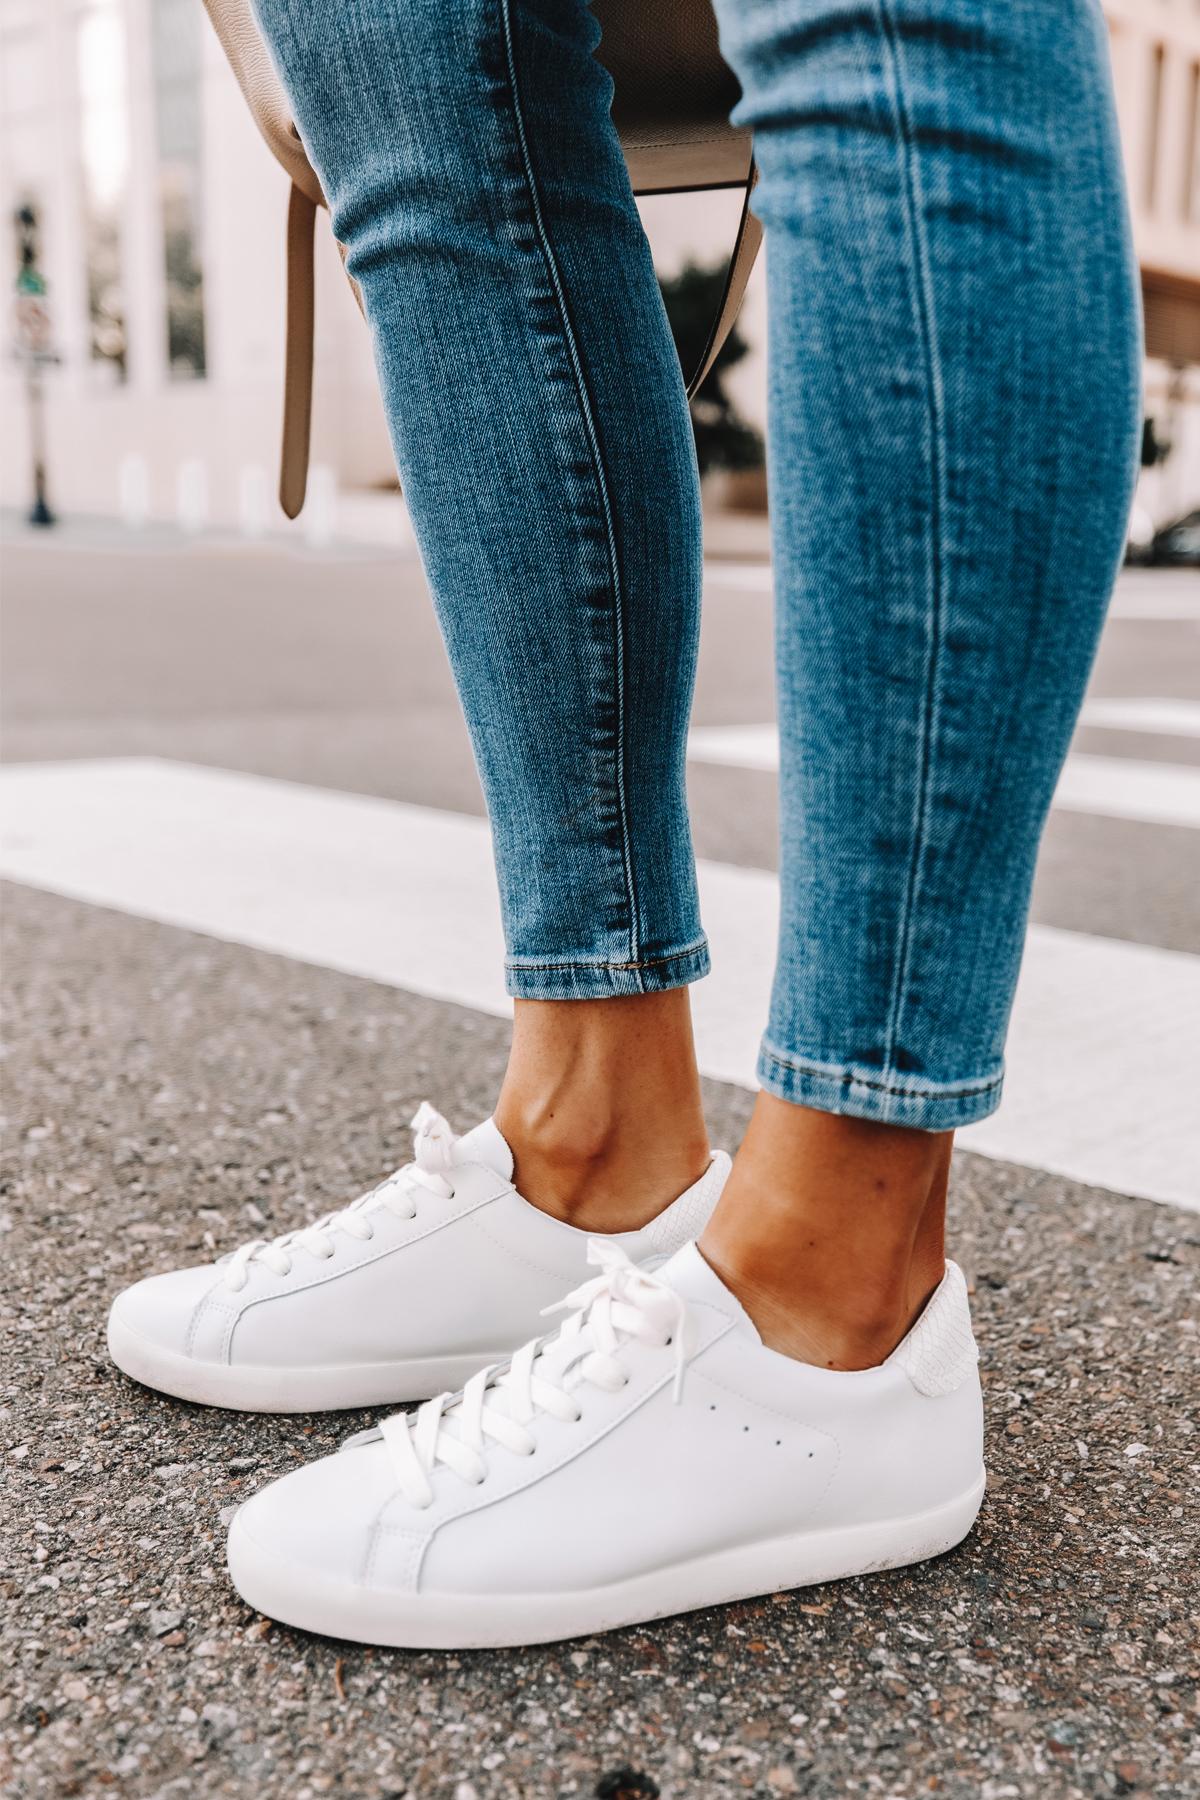 Fashion Jackson Wearing Banana Republic Skinny Jeans White Sneakers